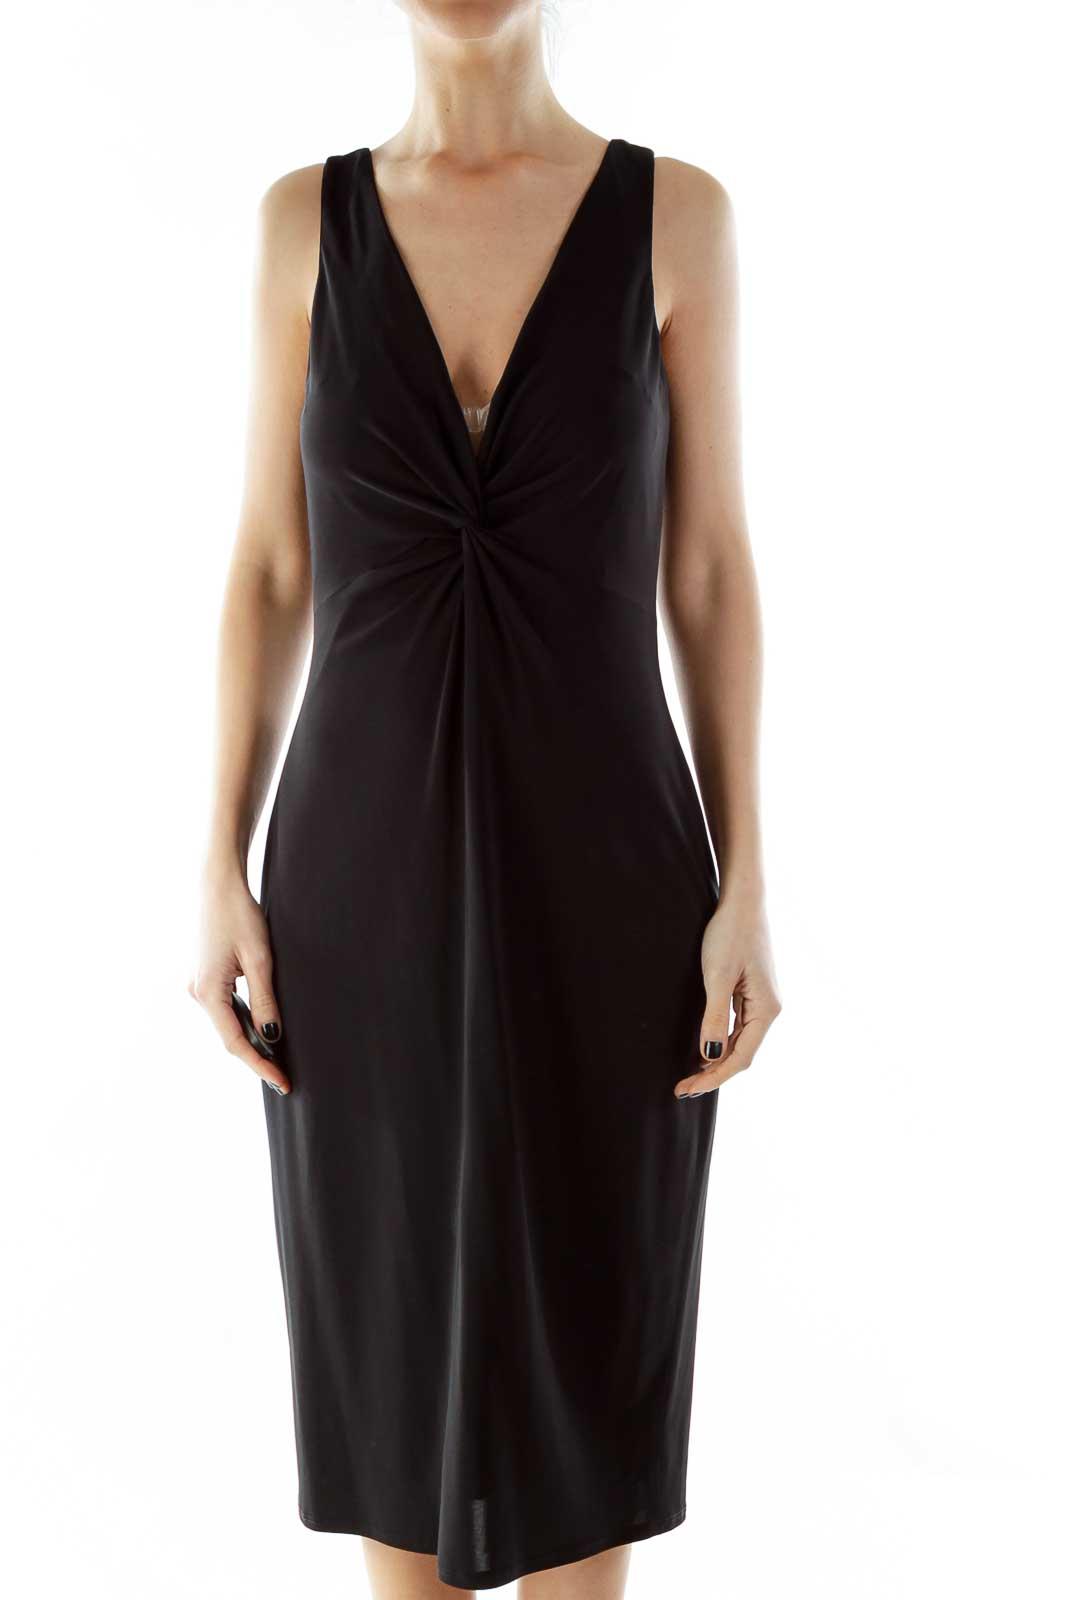 Black V-Neck Cocktail Dress With Knot Front